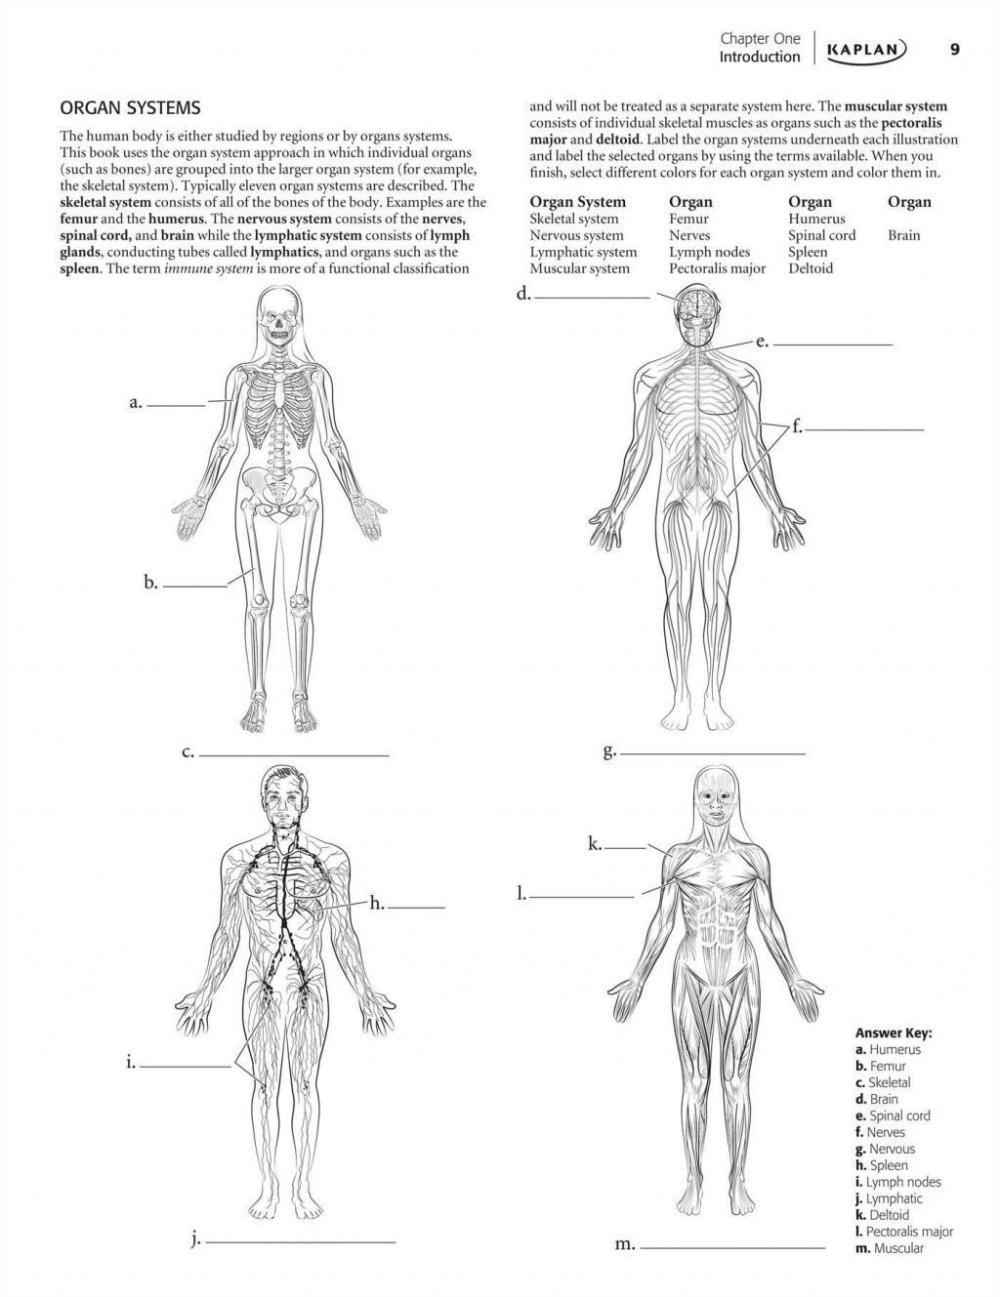 Human Brain Coloring Book Inspirational Anatomy 3rd